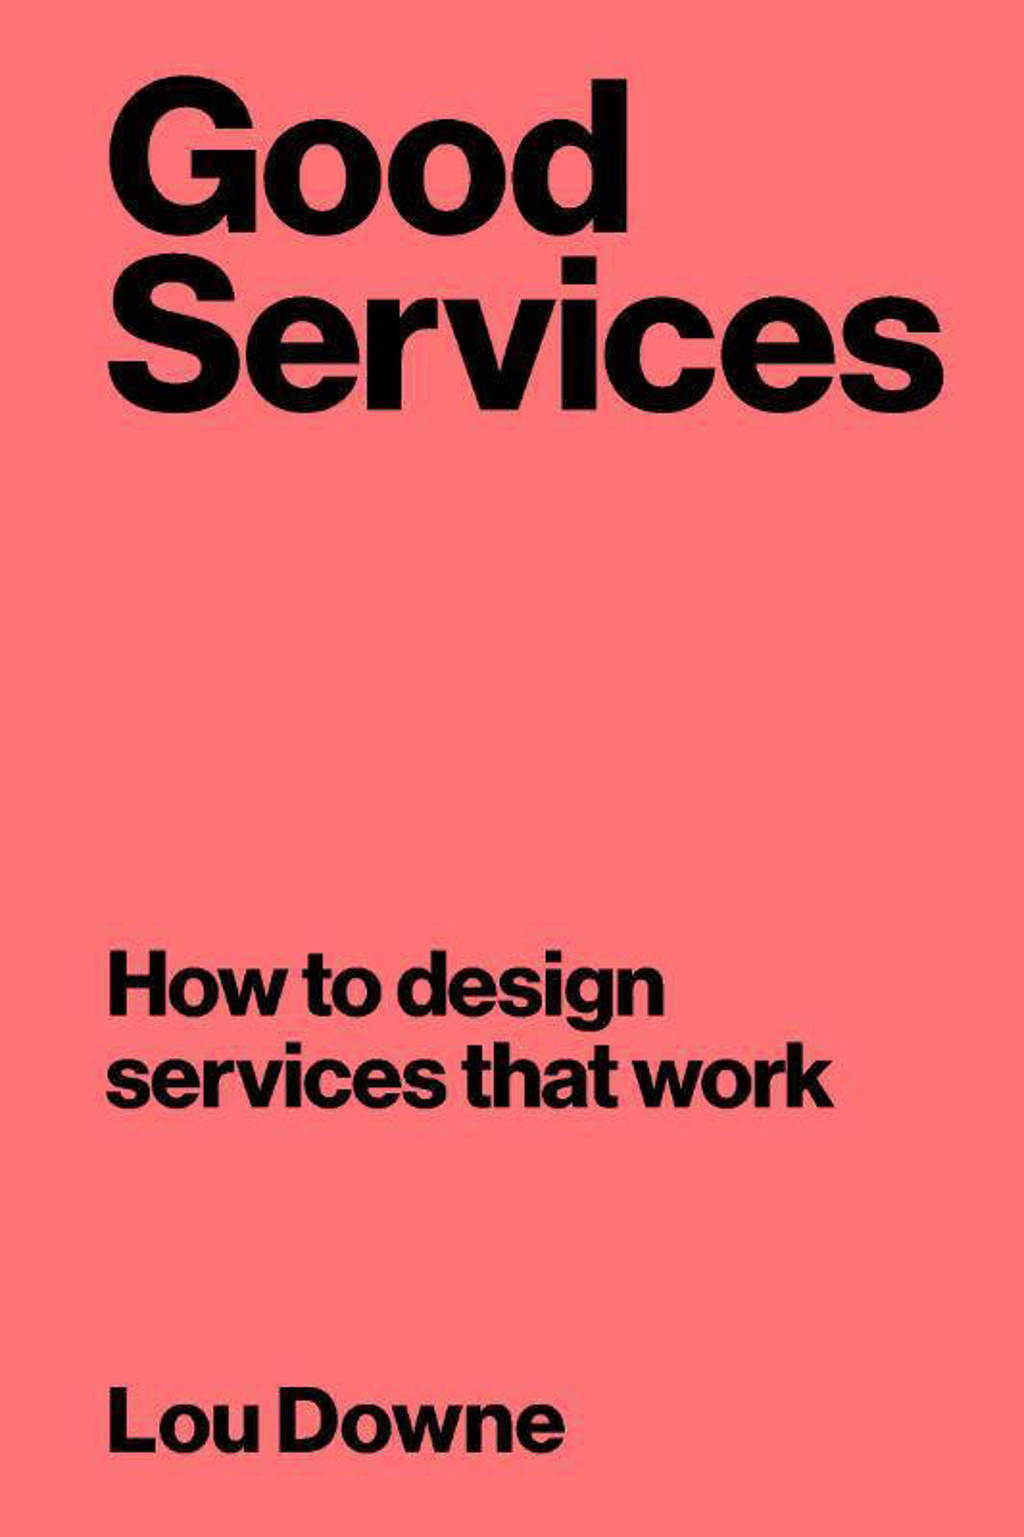 Good Services - Lou Downe